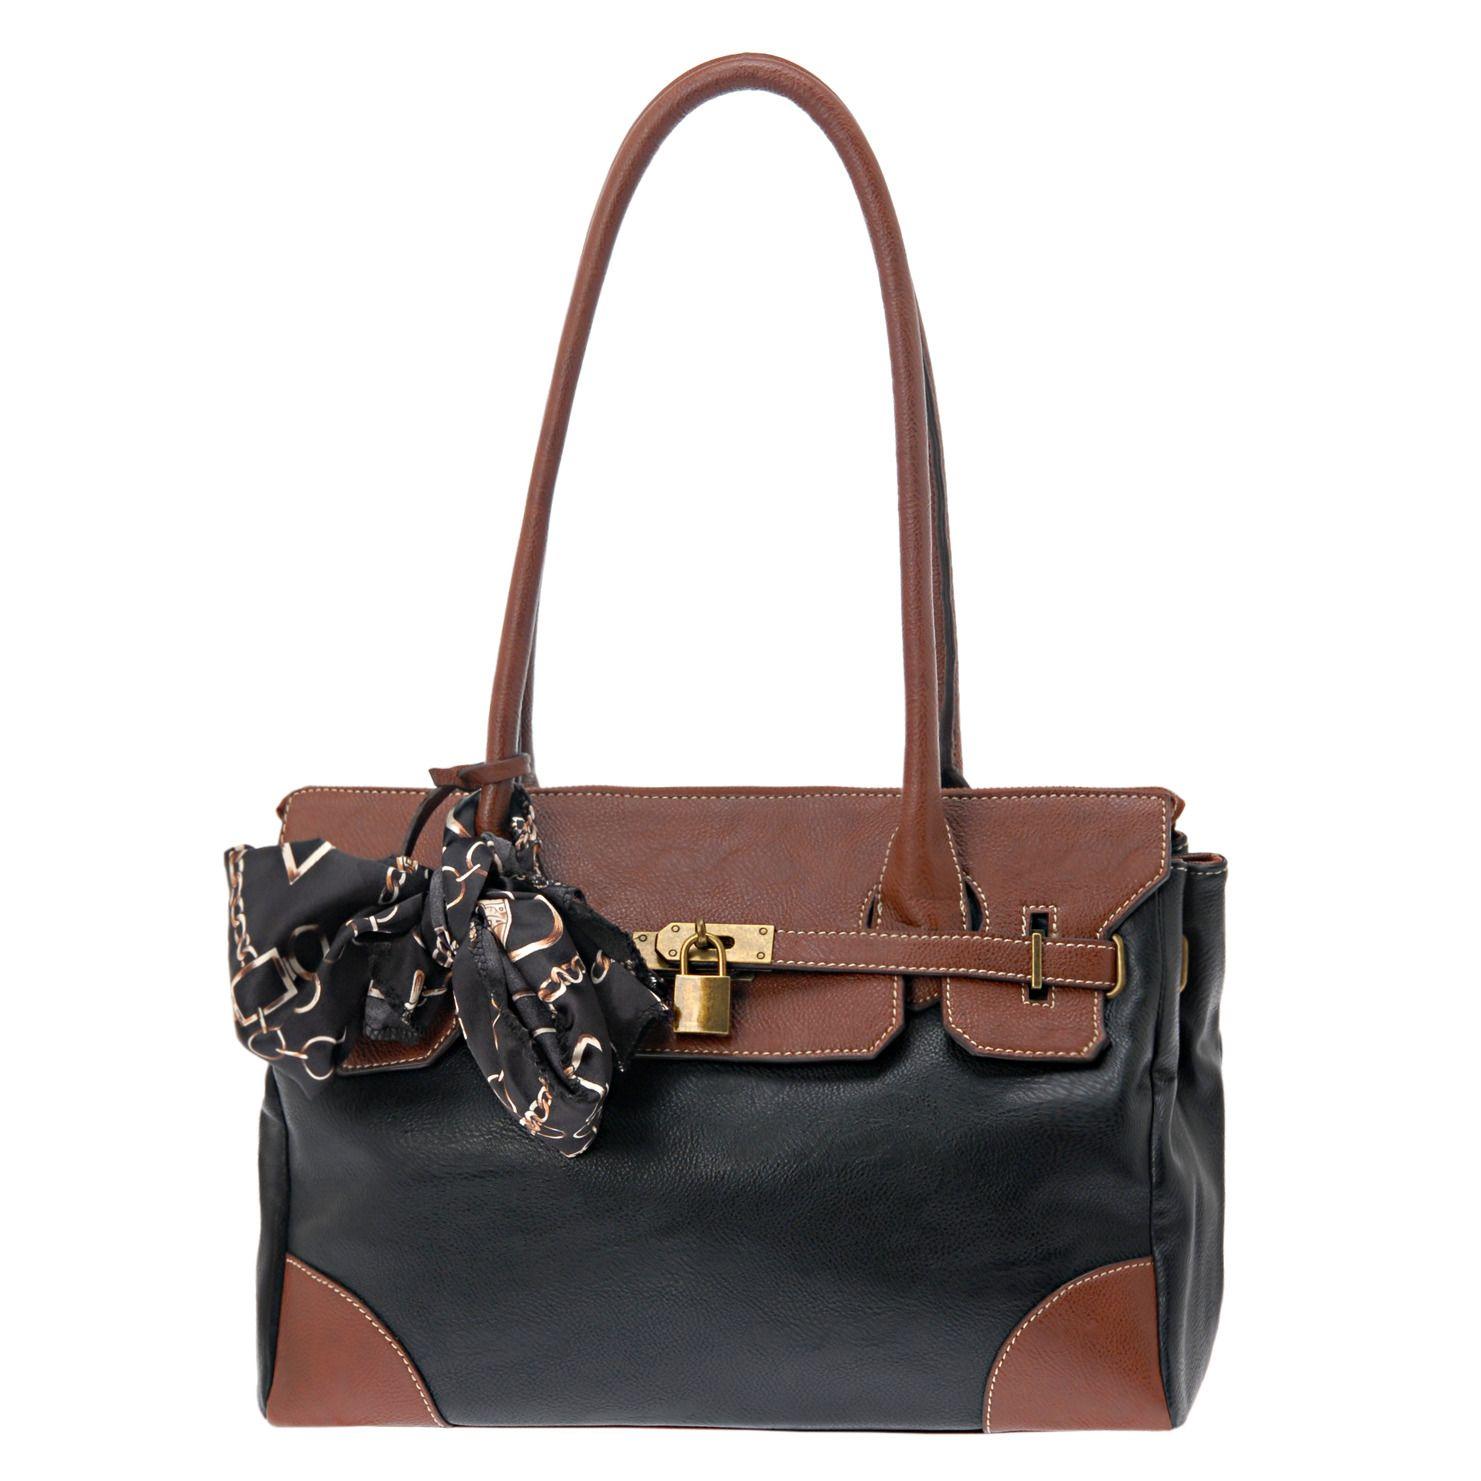 Pin By Eliza Sarobhasa On Wear Me Out Bags Handbag